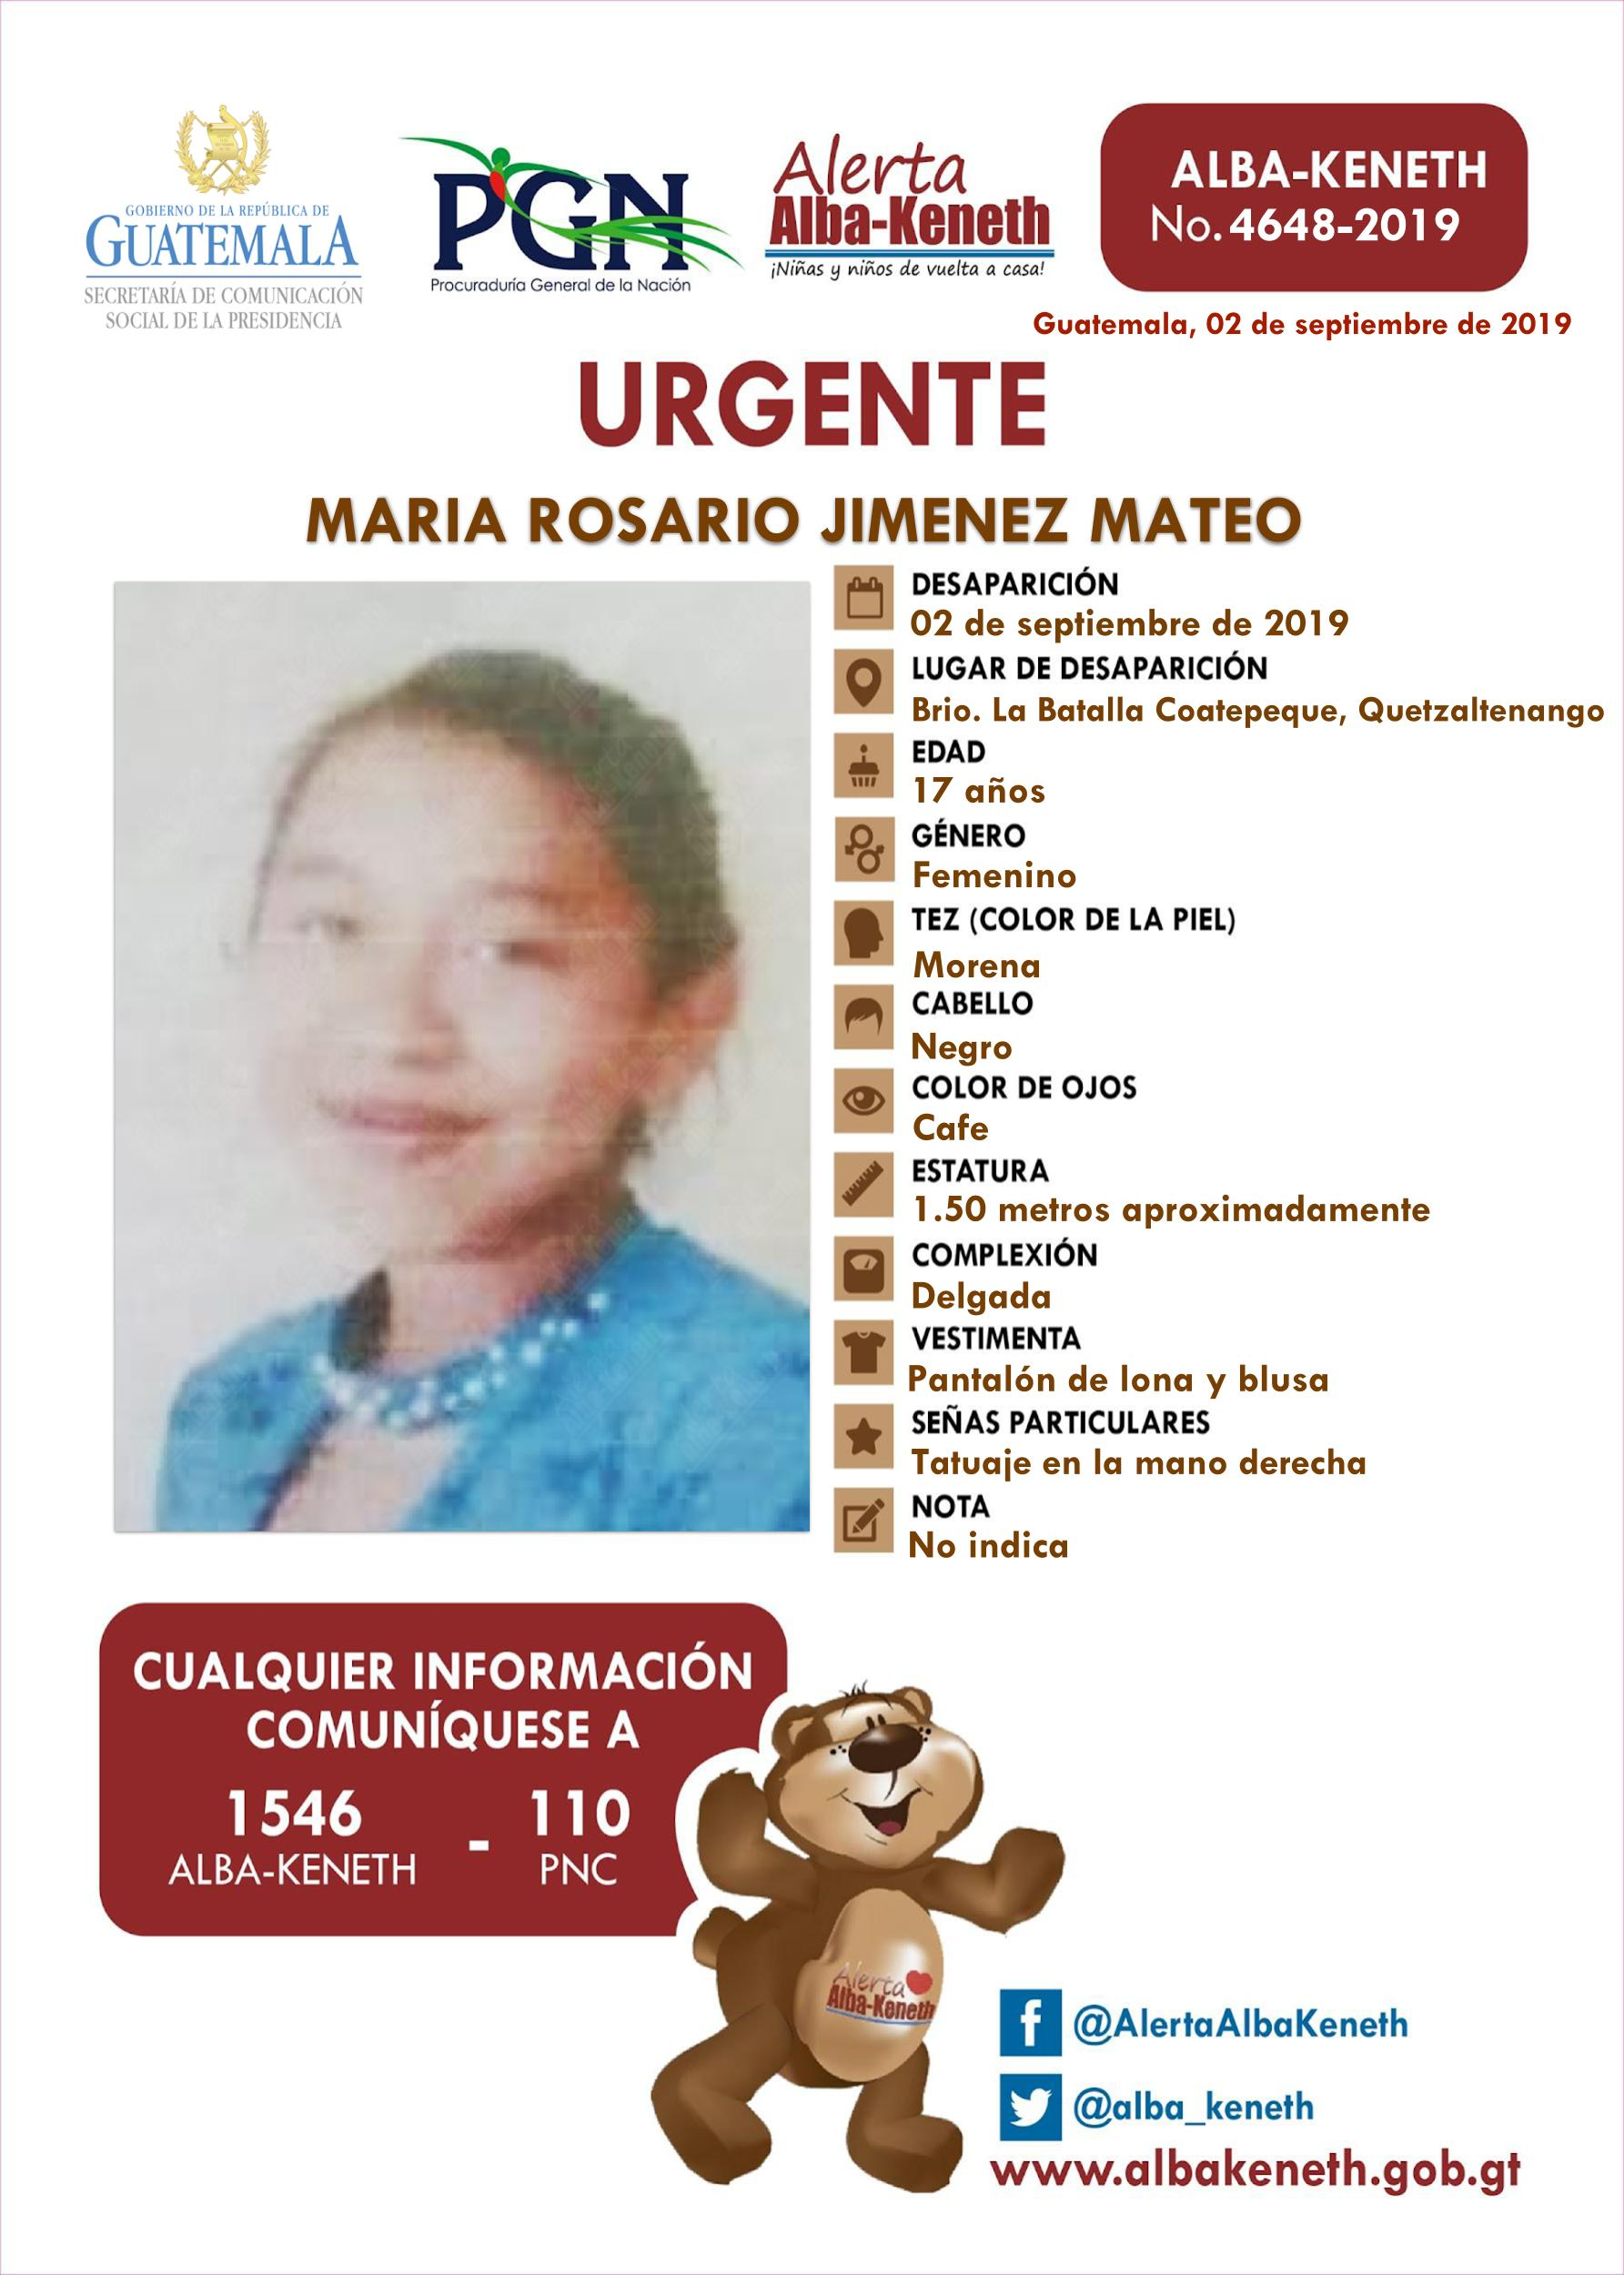 Maria Rosario Jimenez Mateo